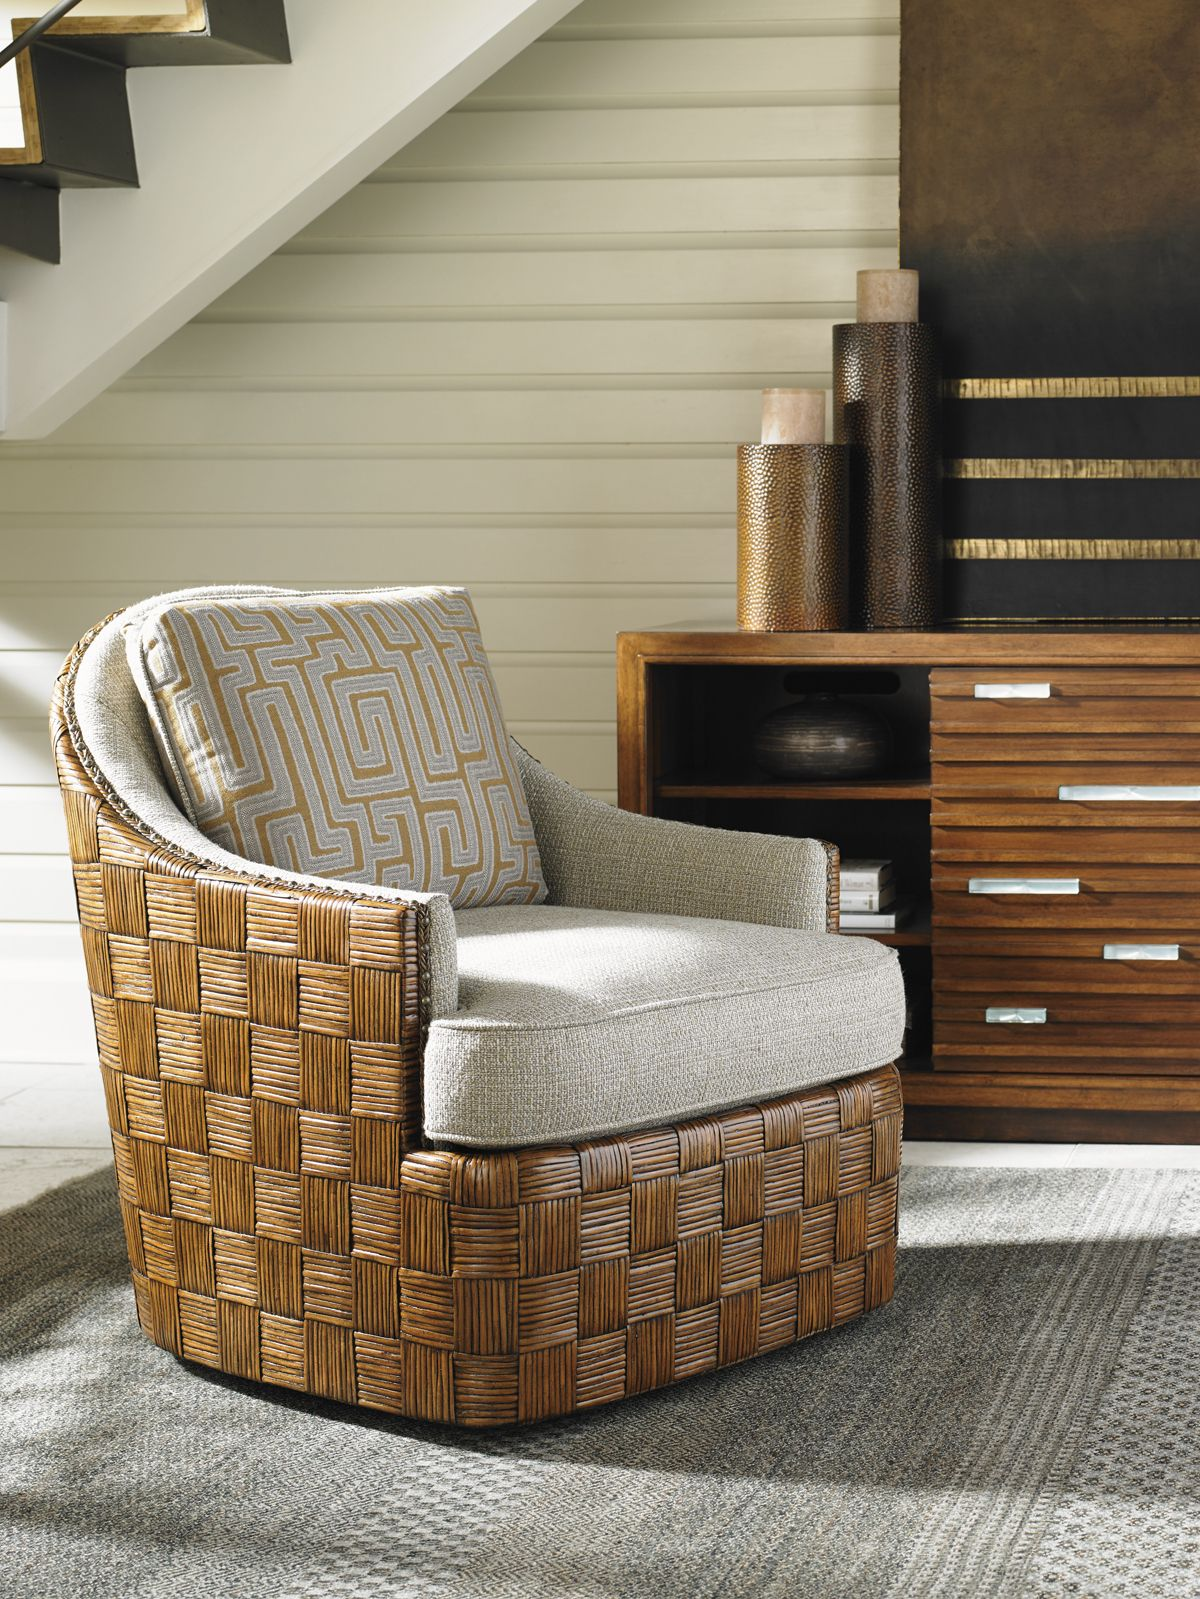 49aa9edeea1 Tommy Bahama Swivel Chair with Woven Rattan Parquet Design